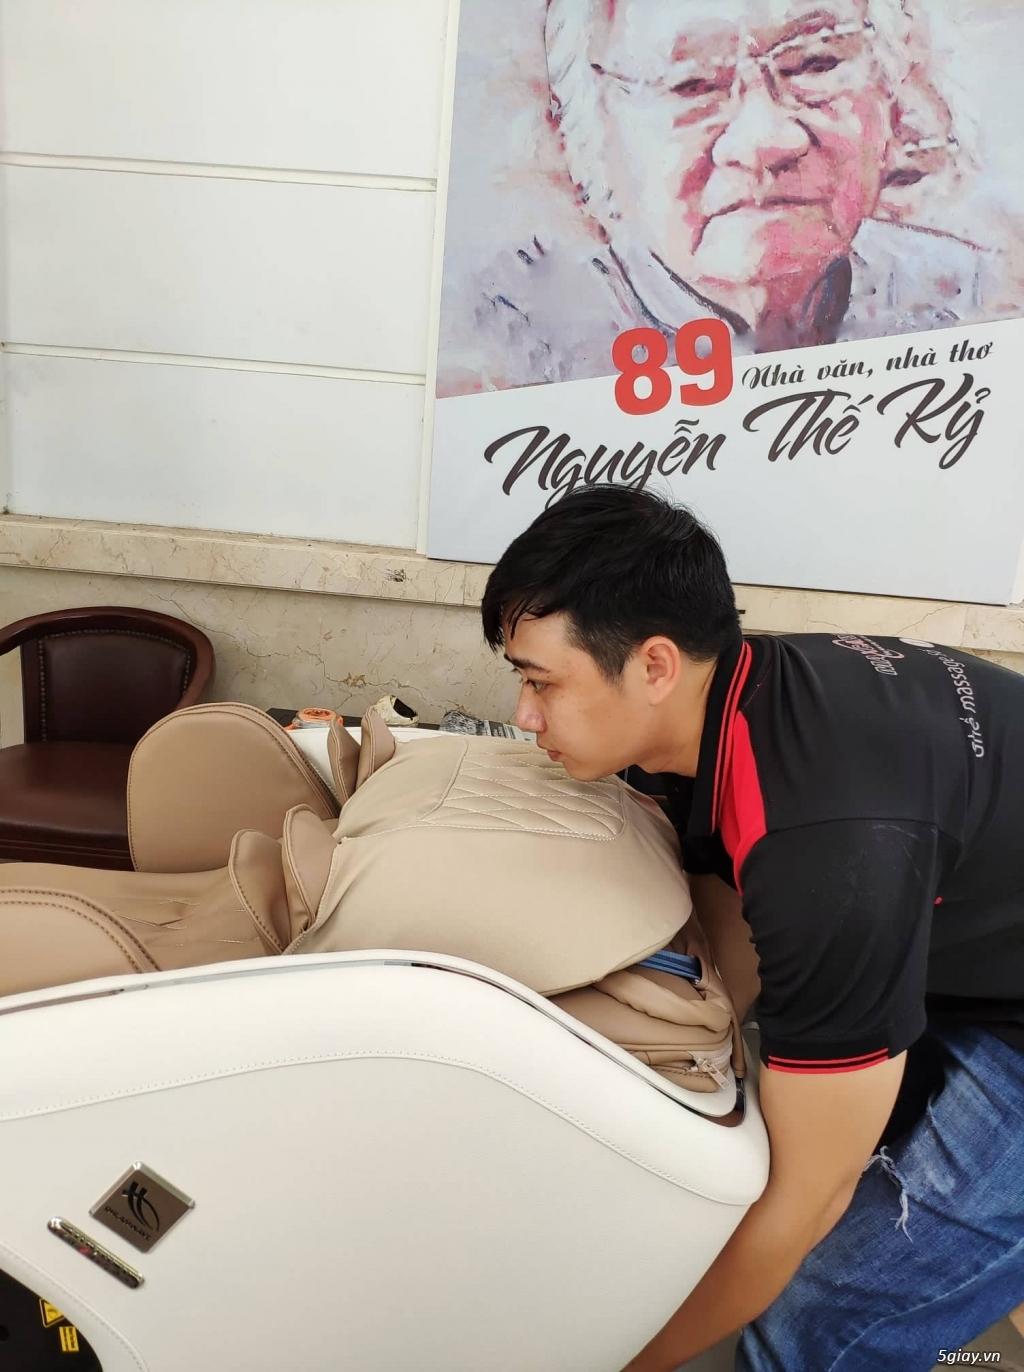 Sửa chửa Ghế Massage tại cầu giấy | Maxcare Home - 6